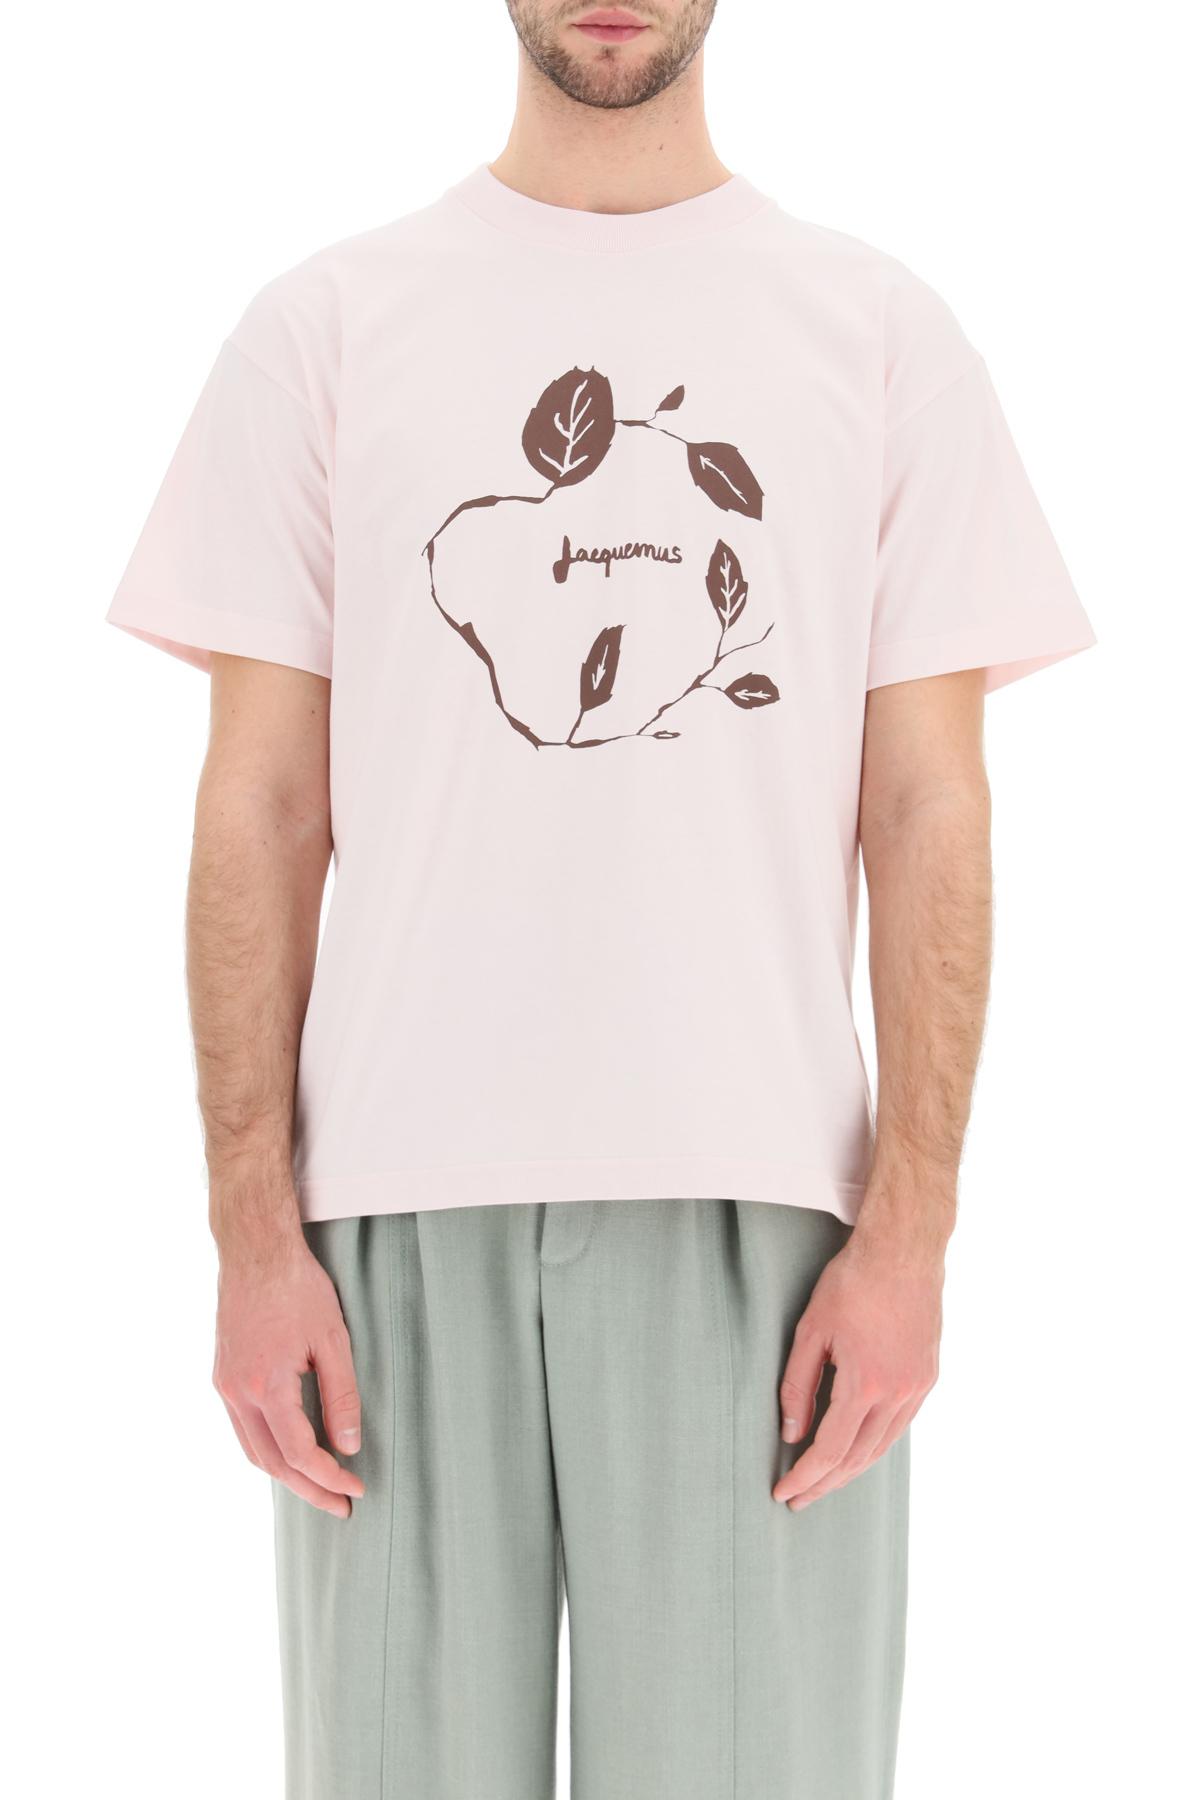 Jacquemus t-shirt jean